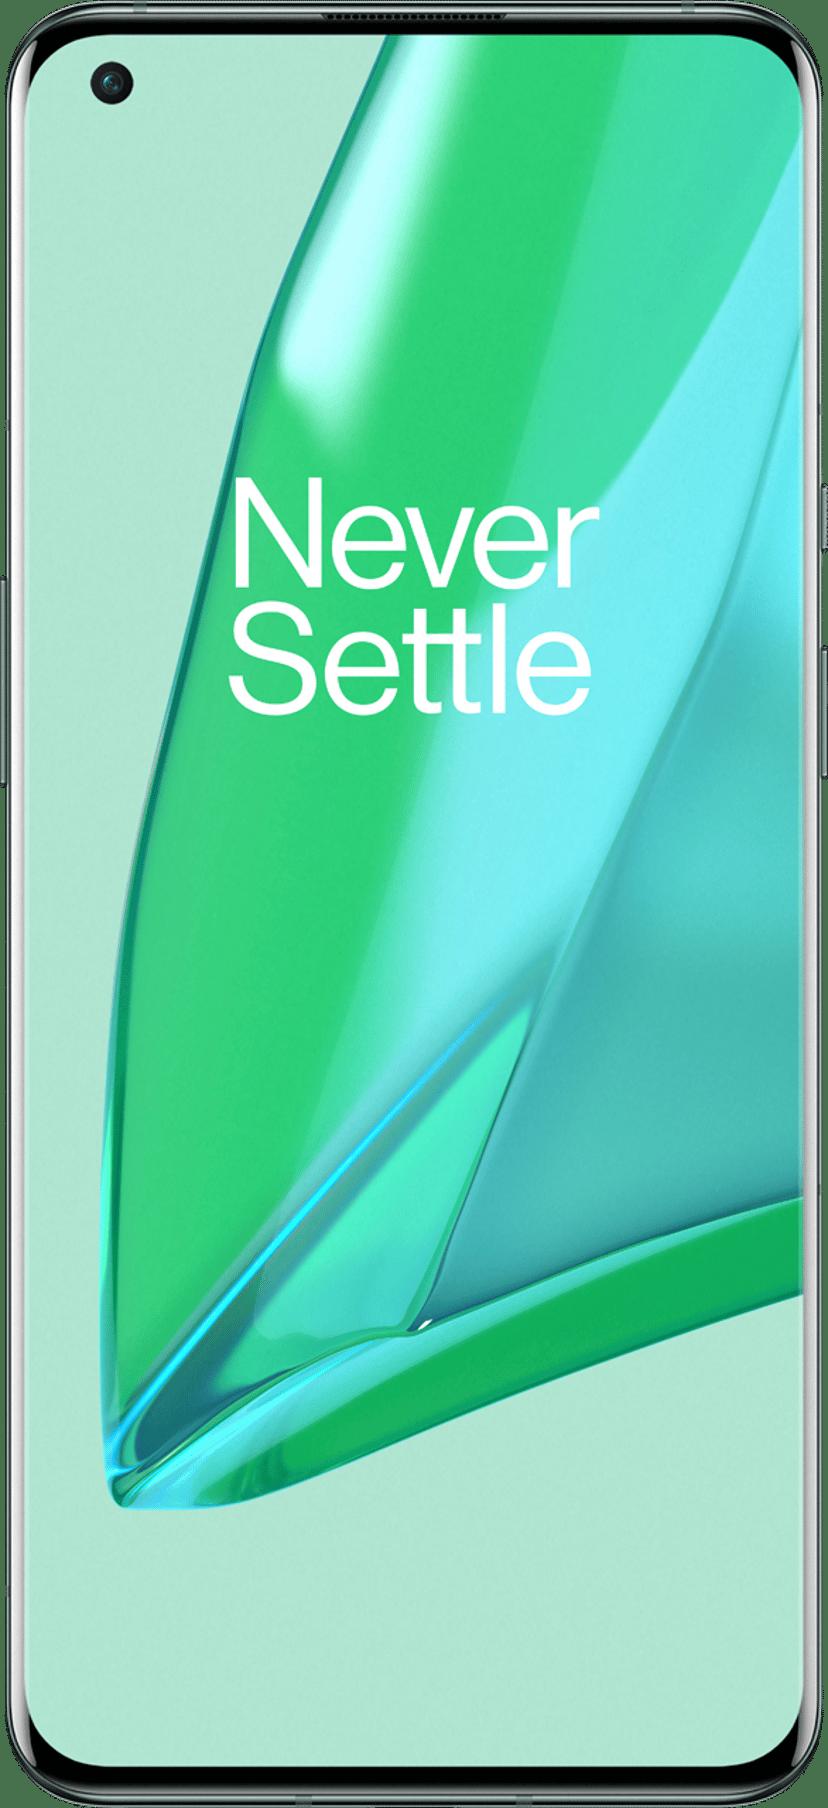 OnePlus 9 Pro 256GB Dobbelt-SIM Furugrønn